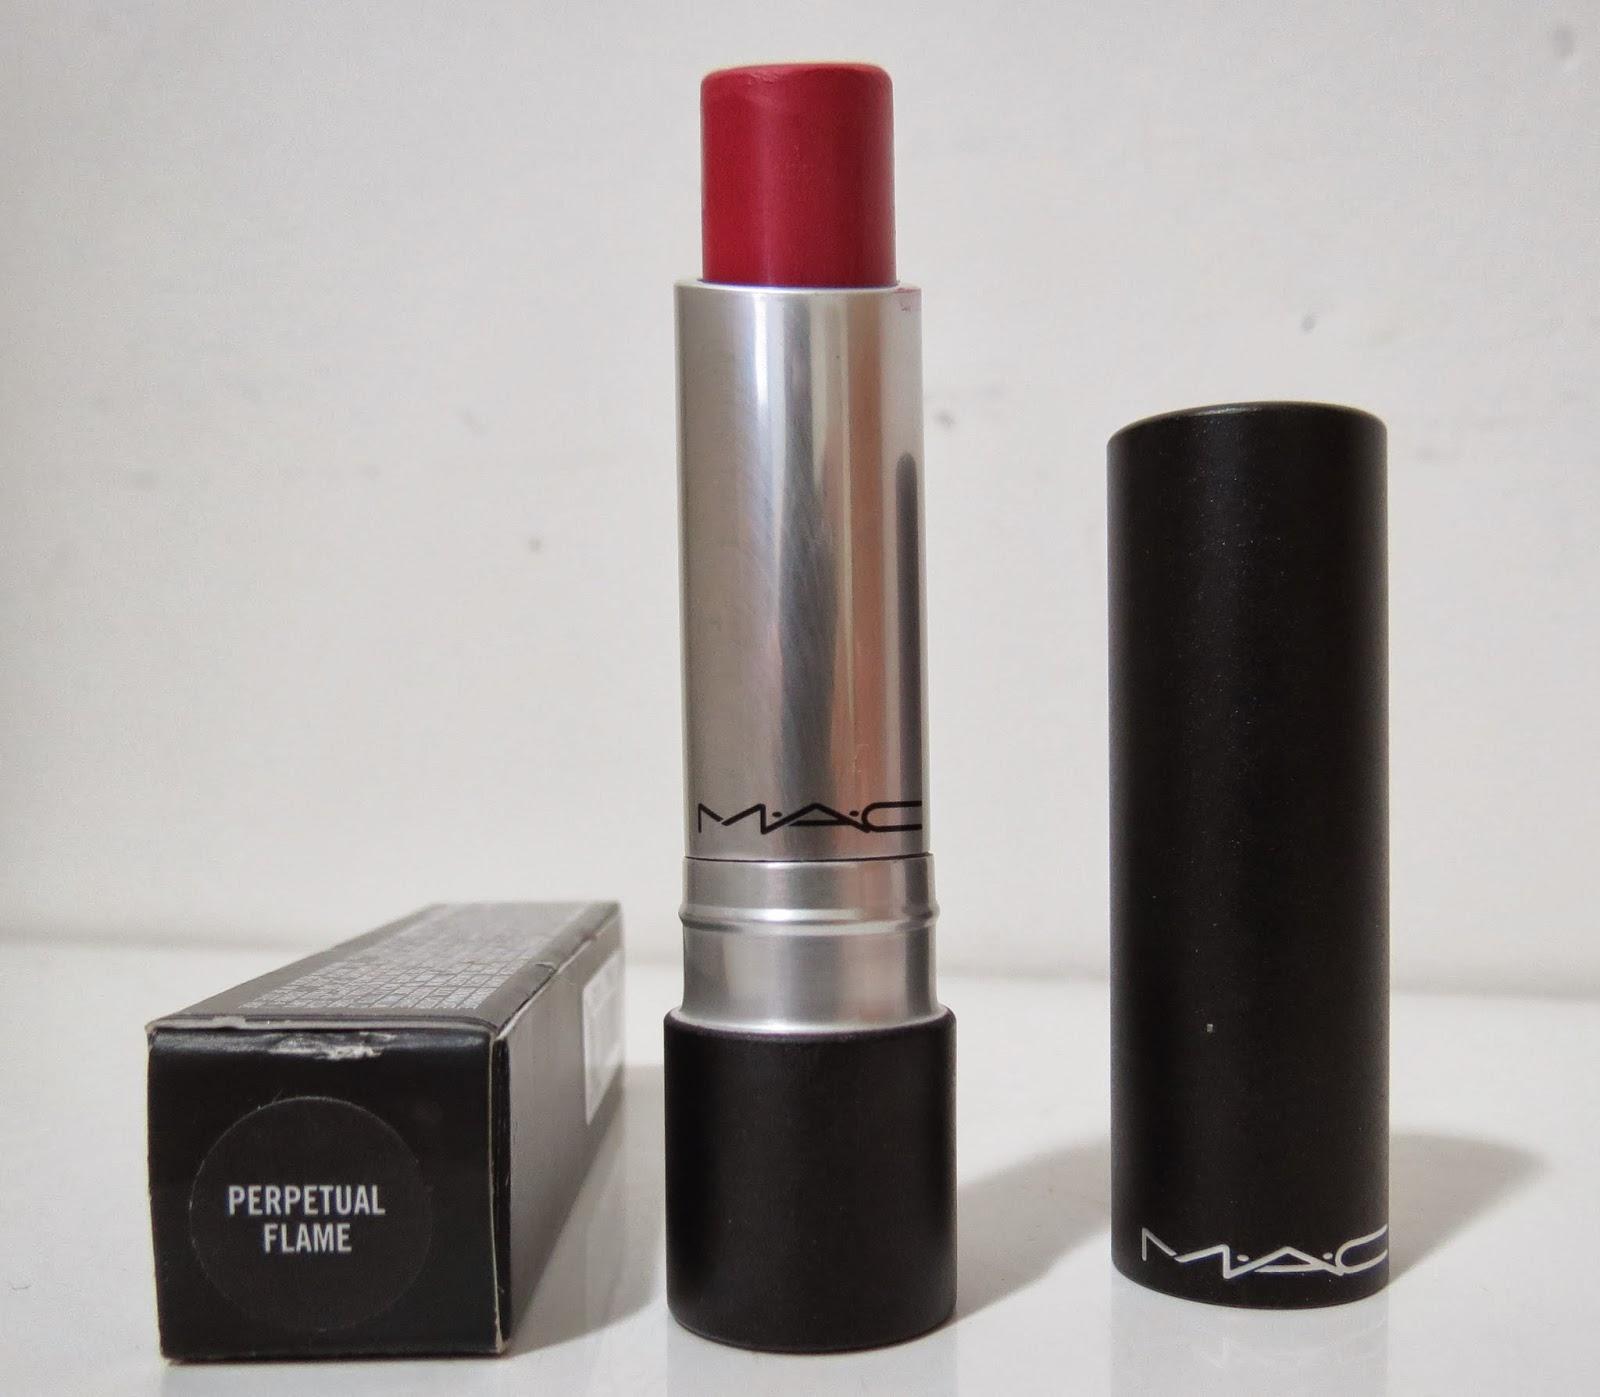 Mac Unlimited Pro Longwear Lipcreme: Review Swatch GLAMOROUS MAKEUP